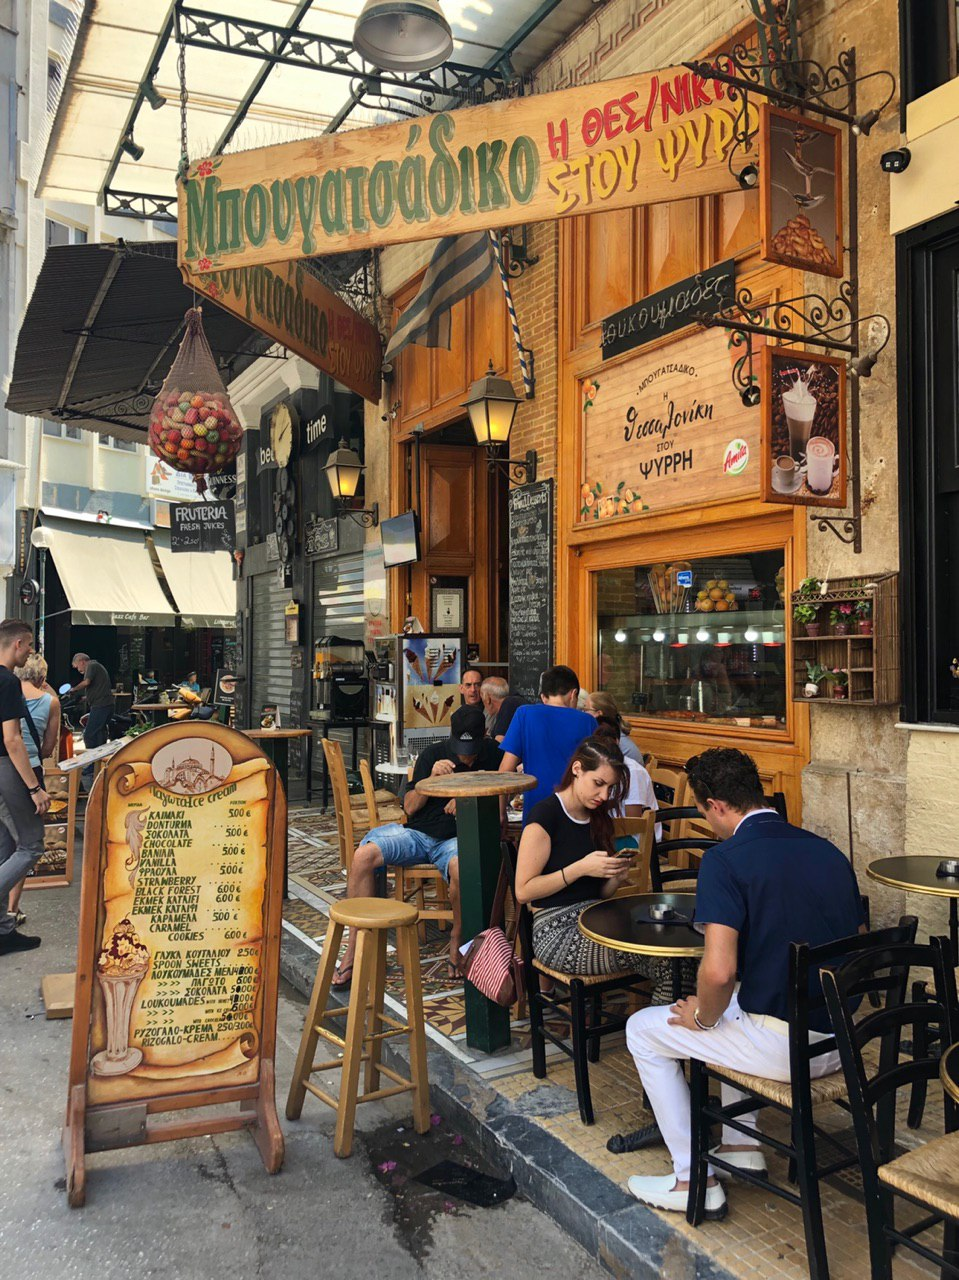 رستوران های پلاکا -plaka resturants